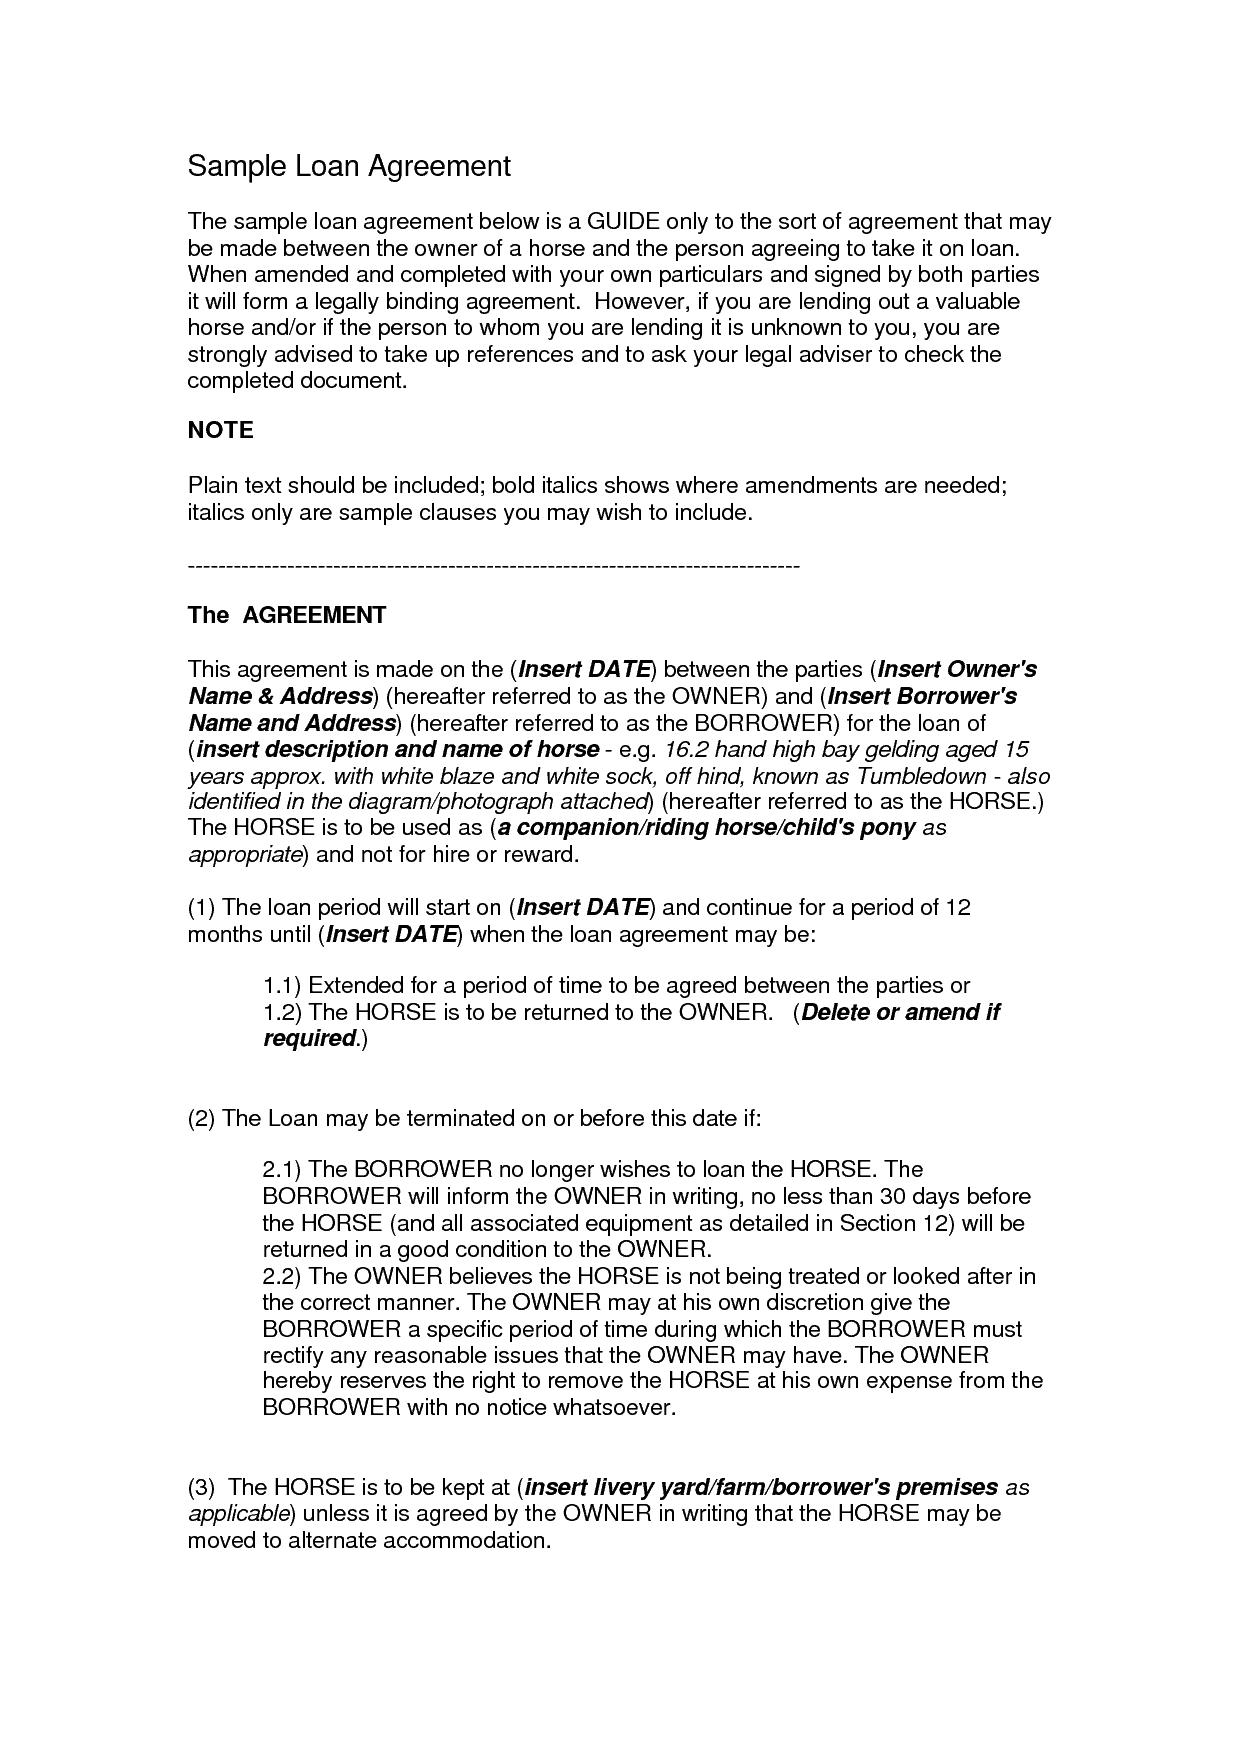 supérieur loan agreement template 9898